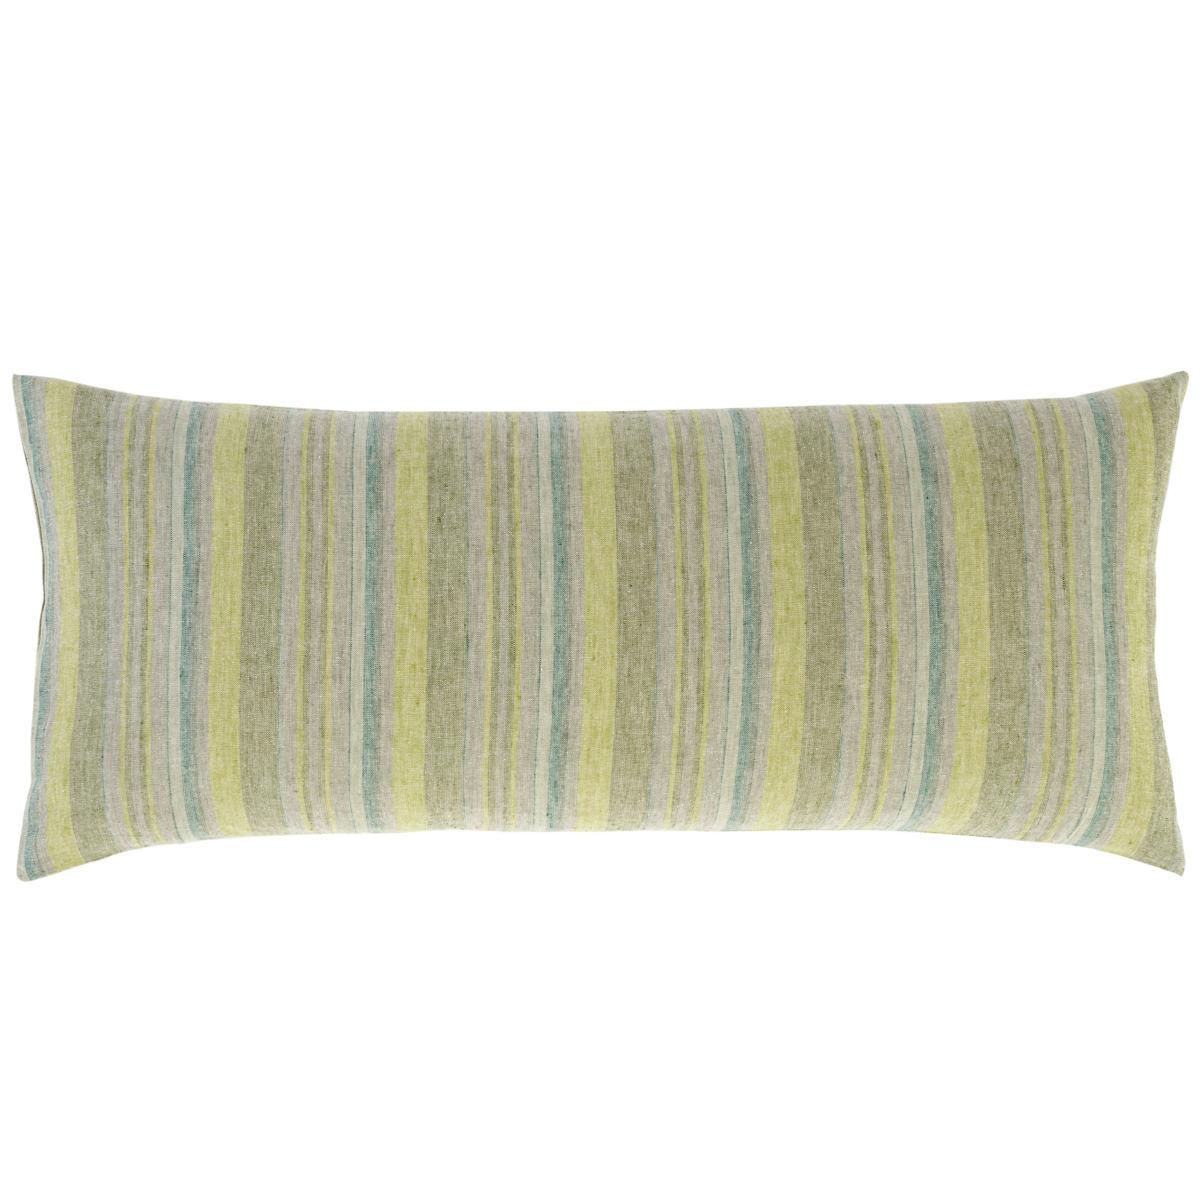 Treetop Linen Stripe Decorative Pillow